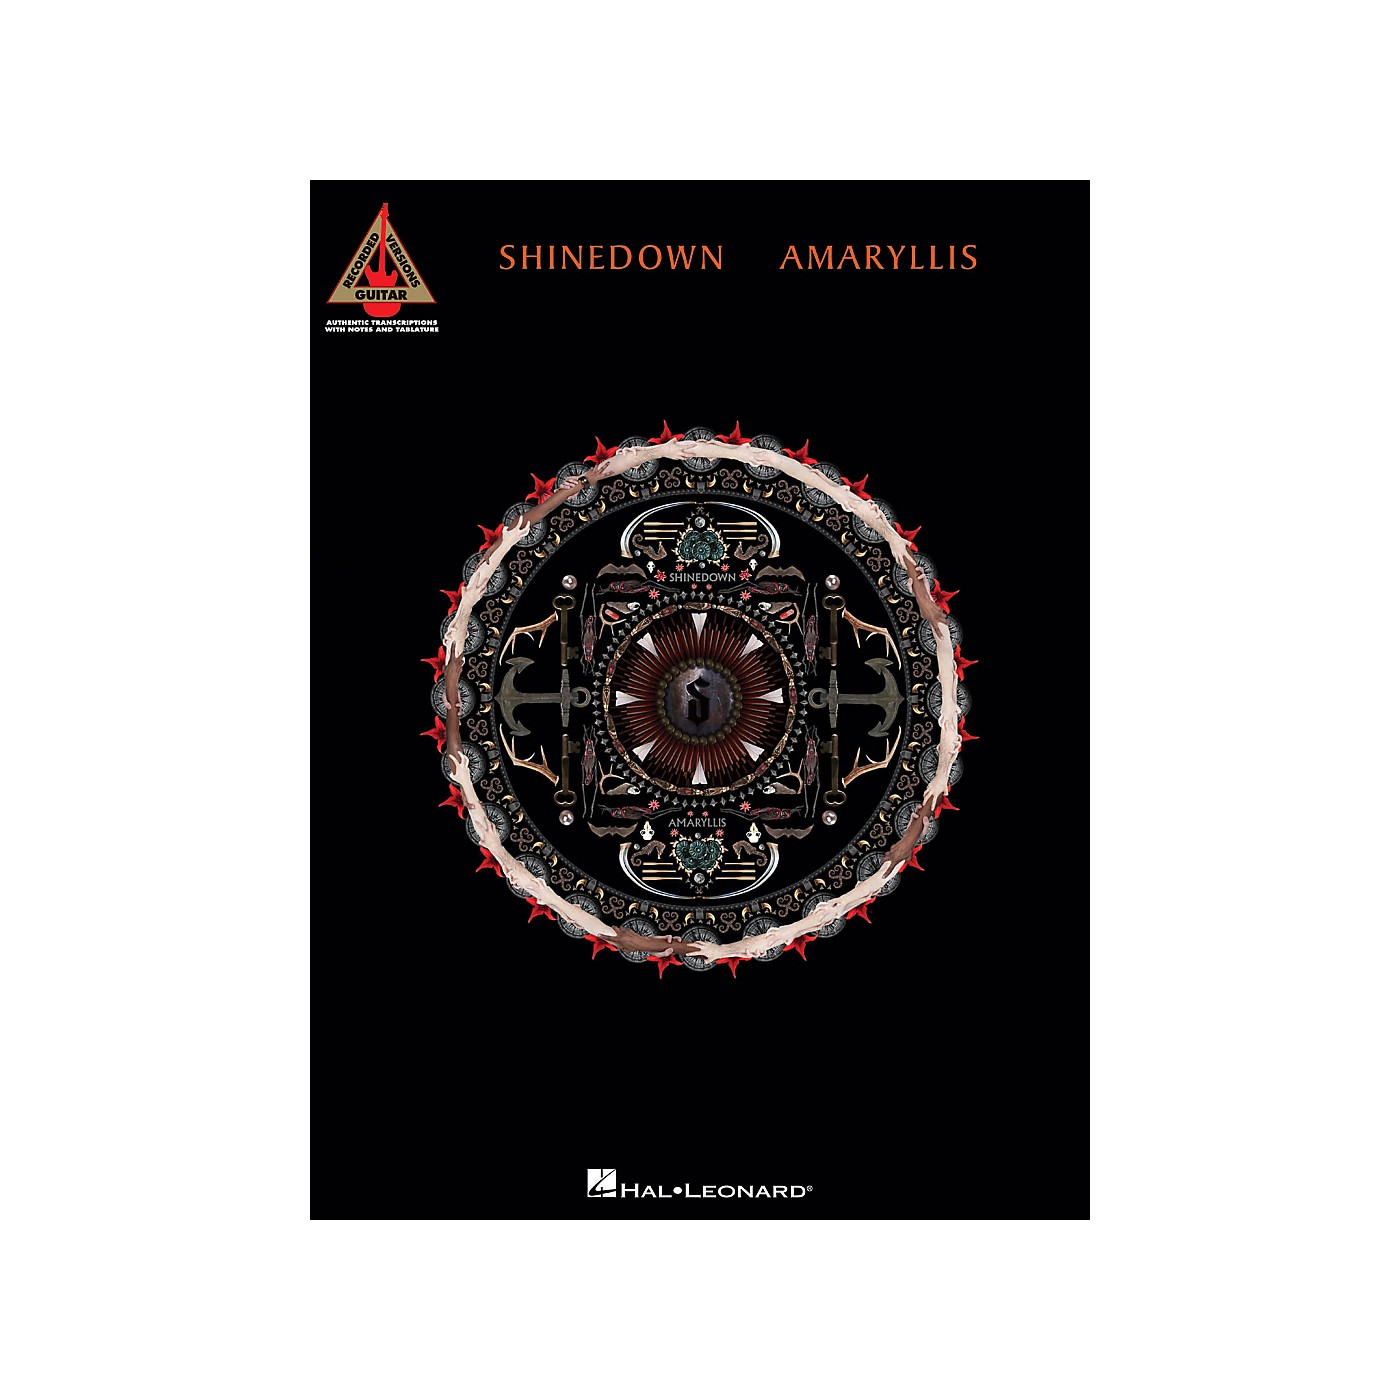 Hal Leonard Shinedown Amaryllis Guitar Tab Songbook thumbnail